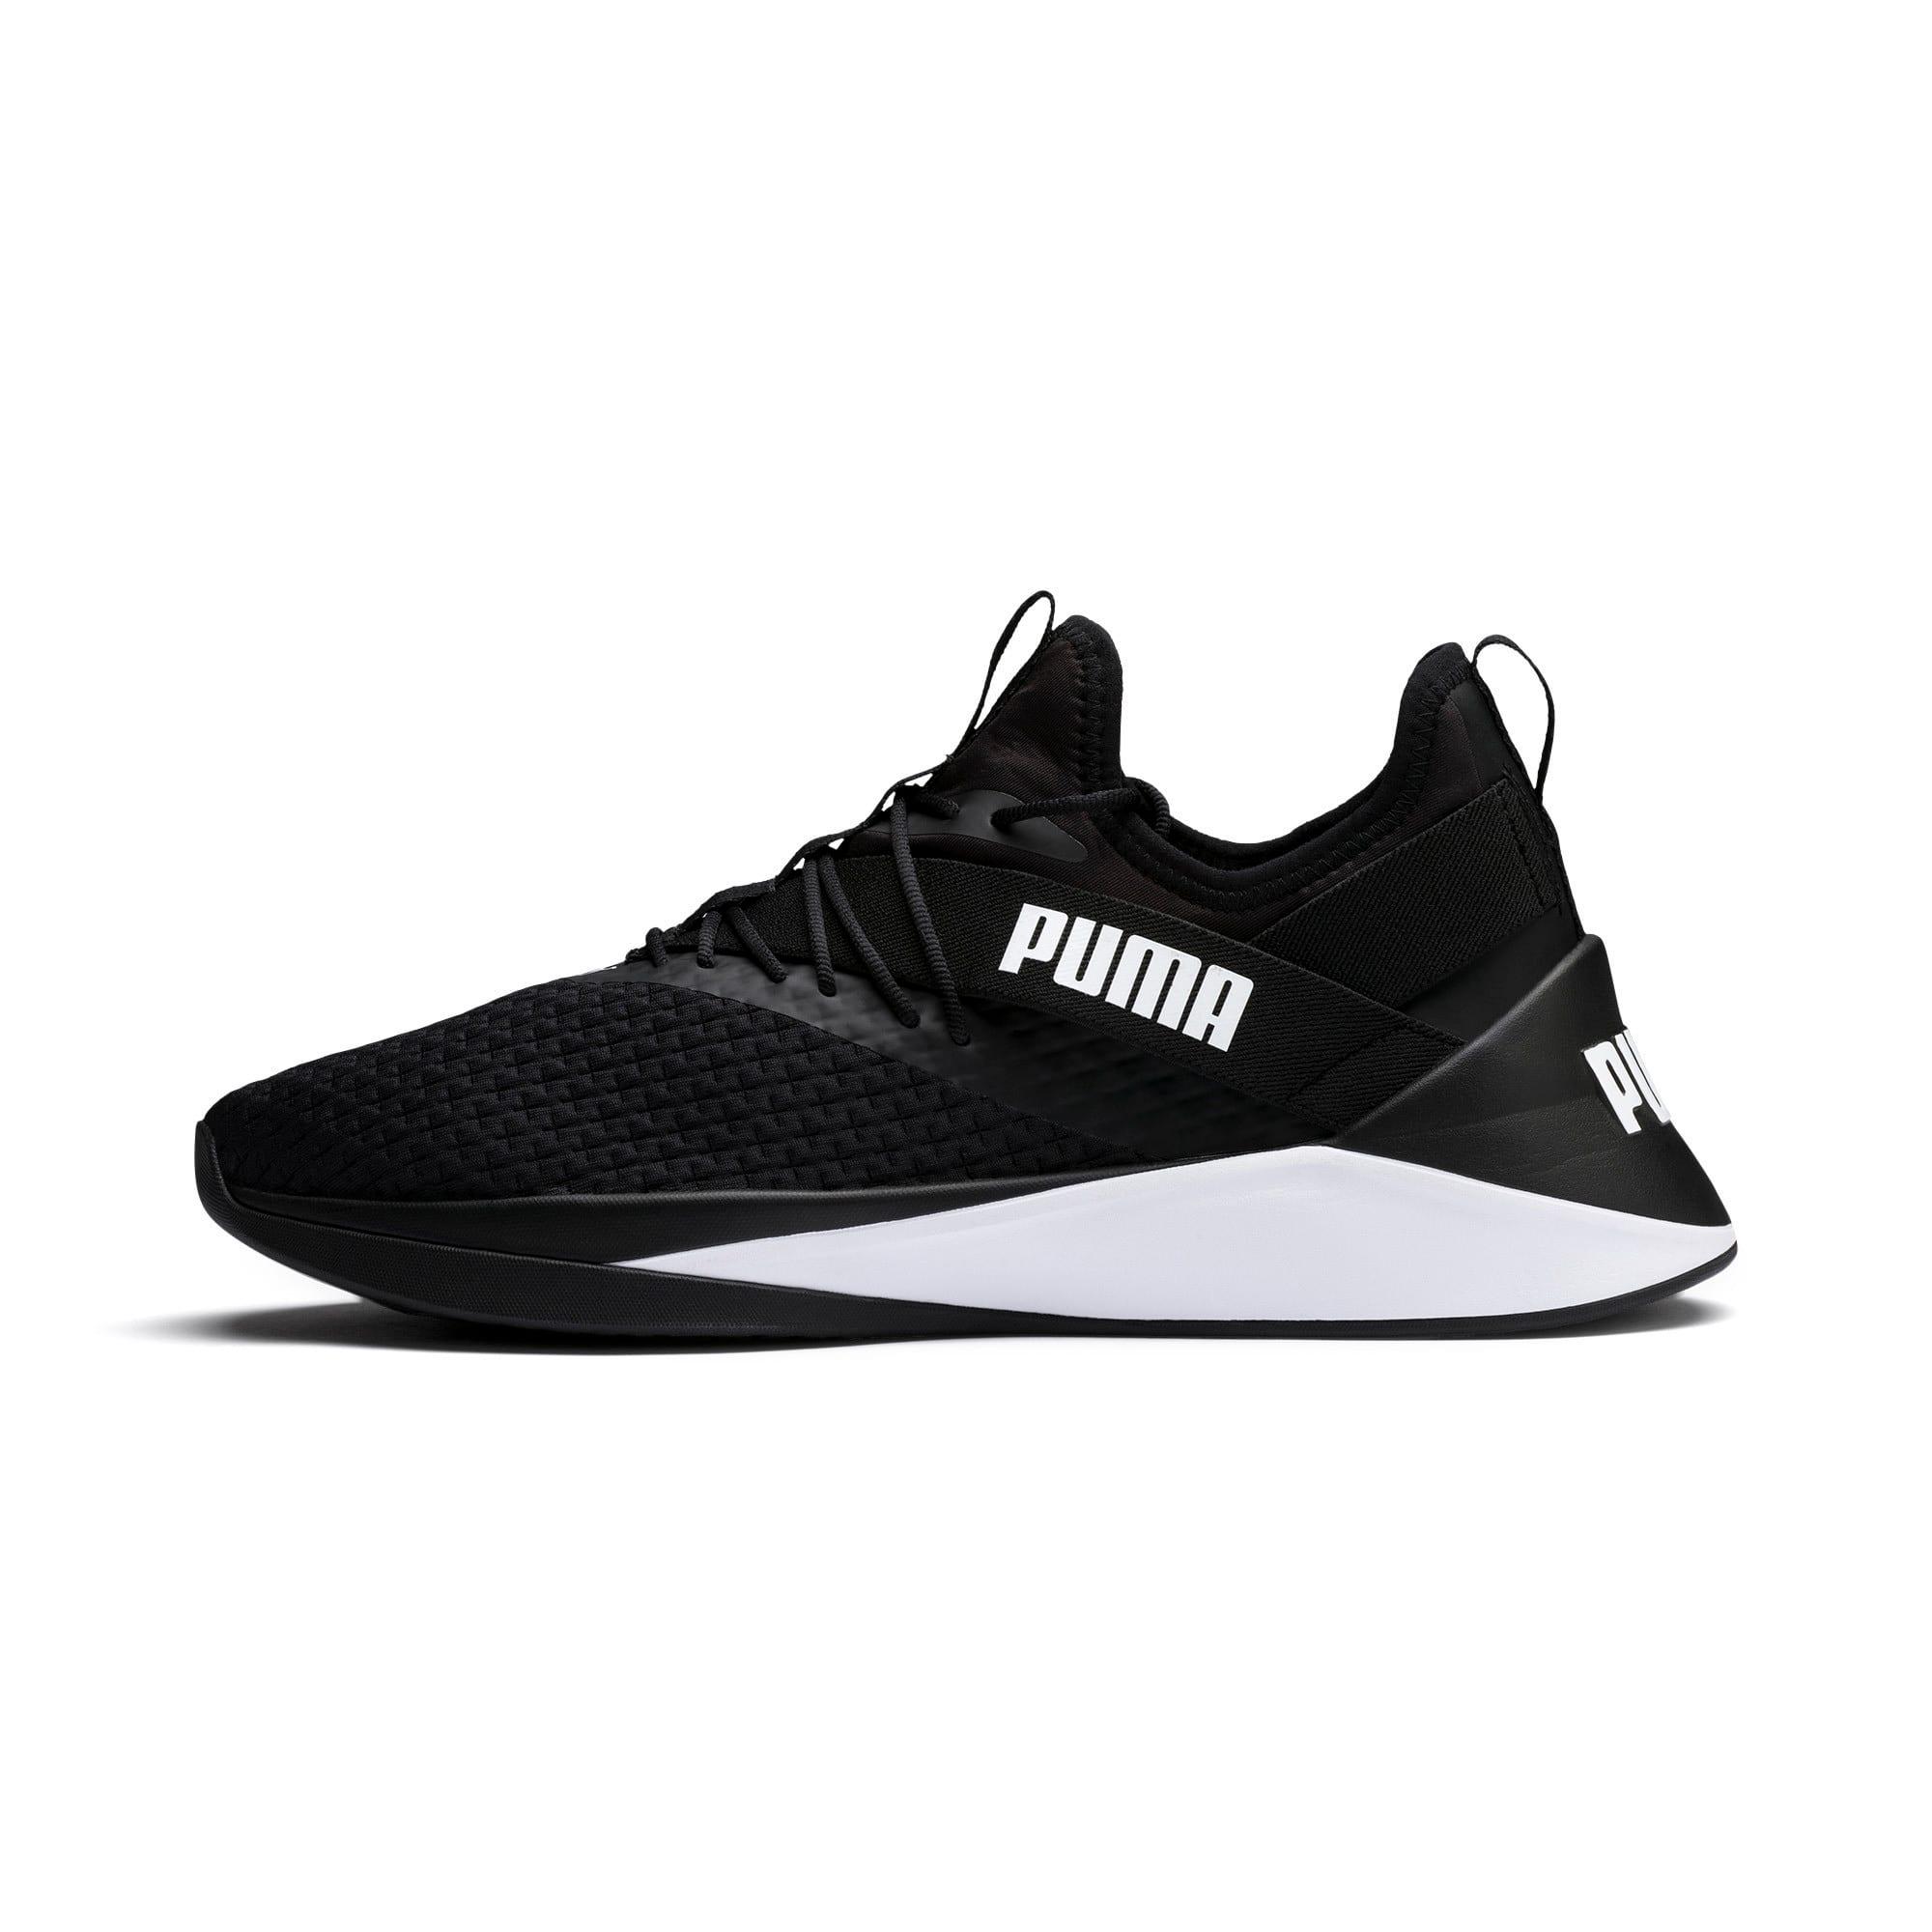 Thumbnail 1 of JAAB XT, Puma Black-Puma White, medium-JPN